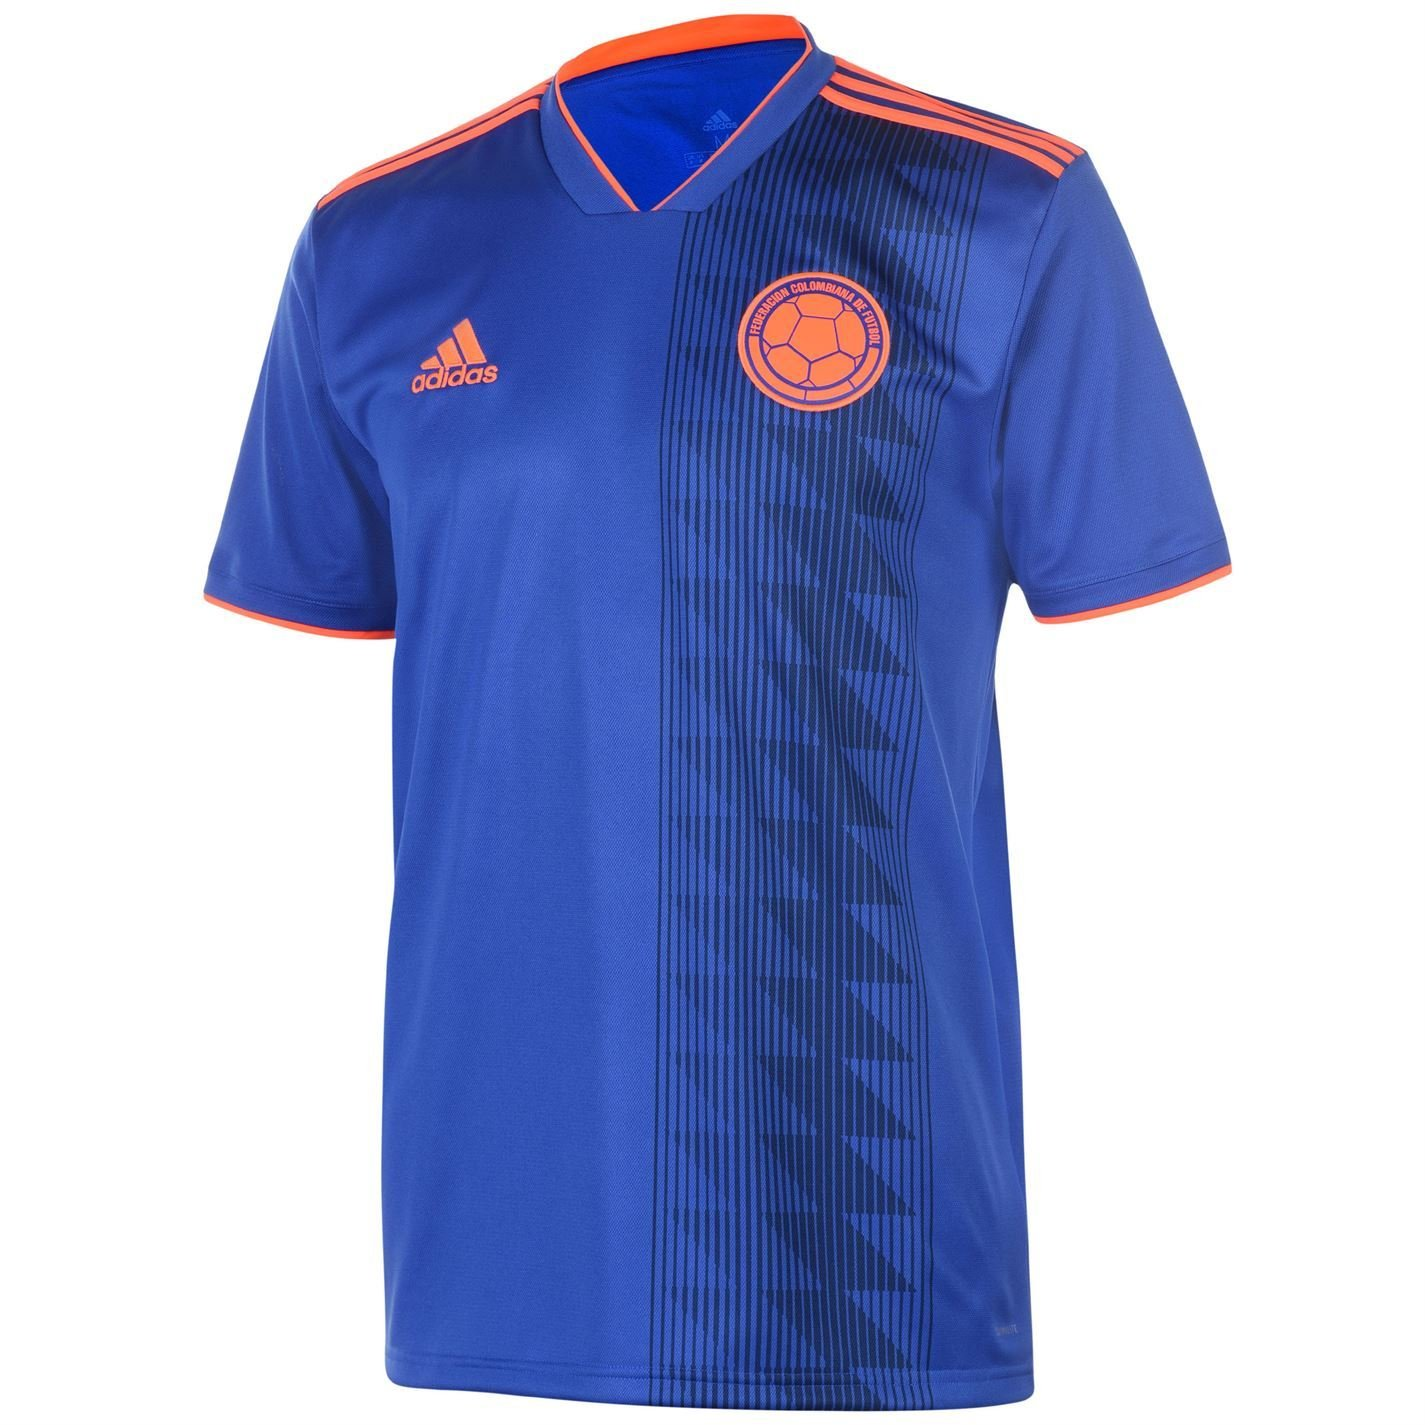 c4c65c38c adidas Colombia Away shirt